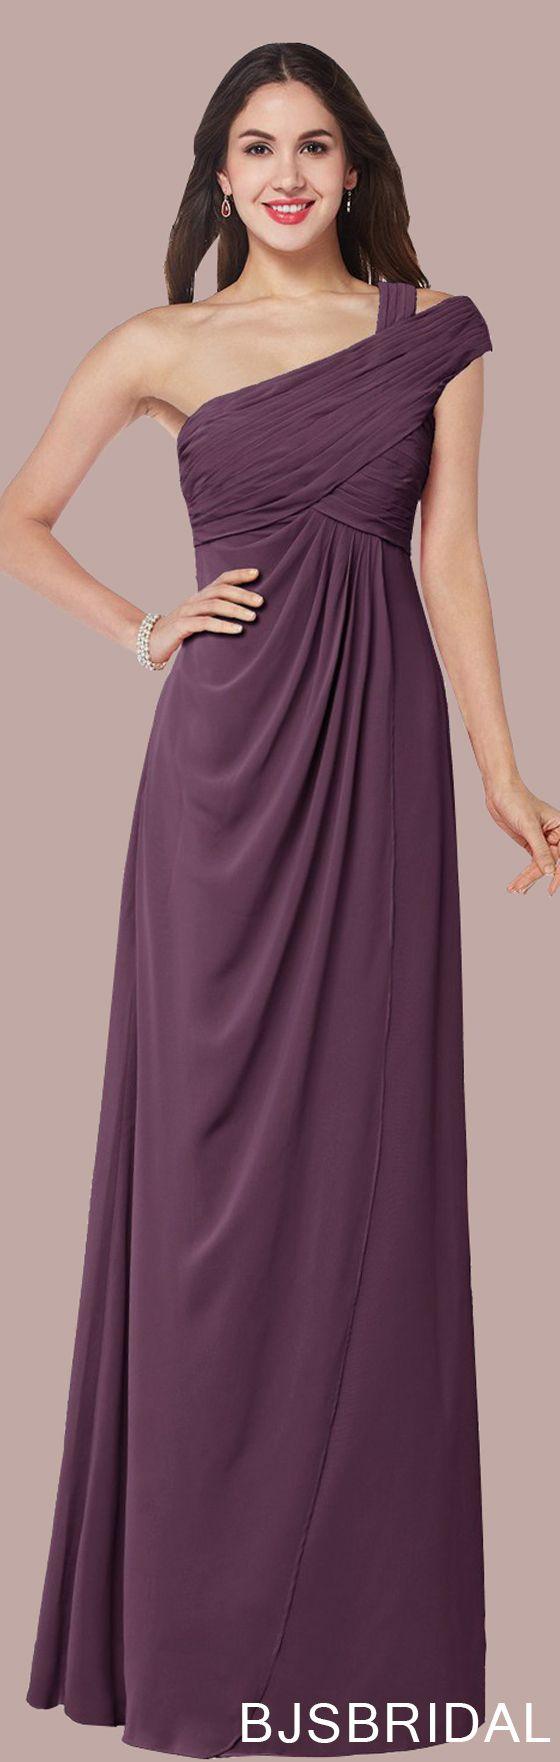 Contemporáneo Short Light Pink Bridesmaid Dresses Inspiración ...